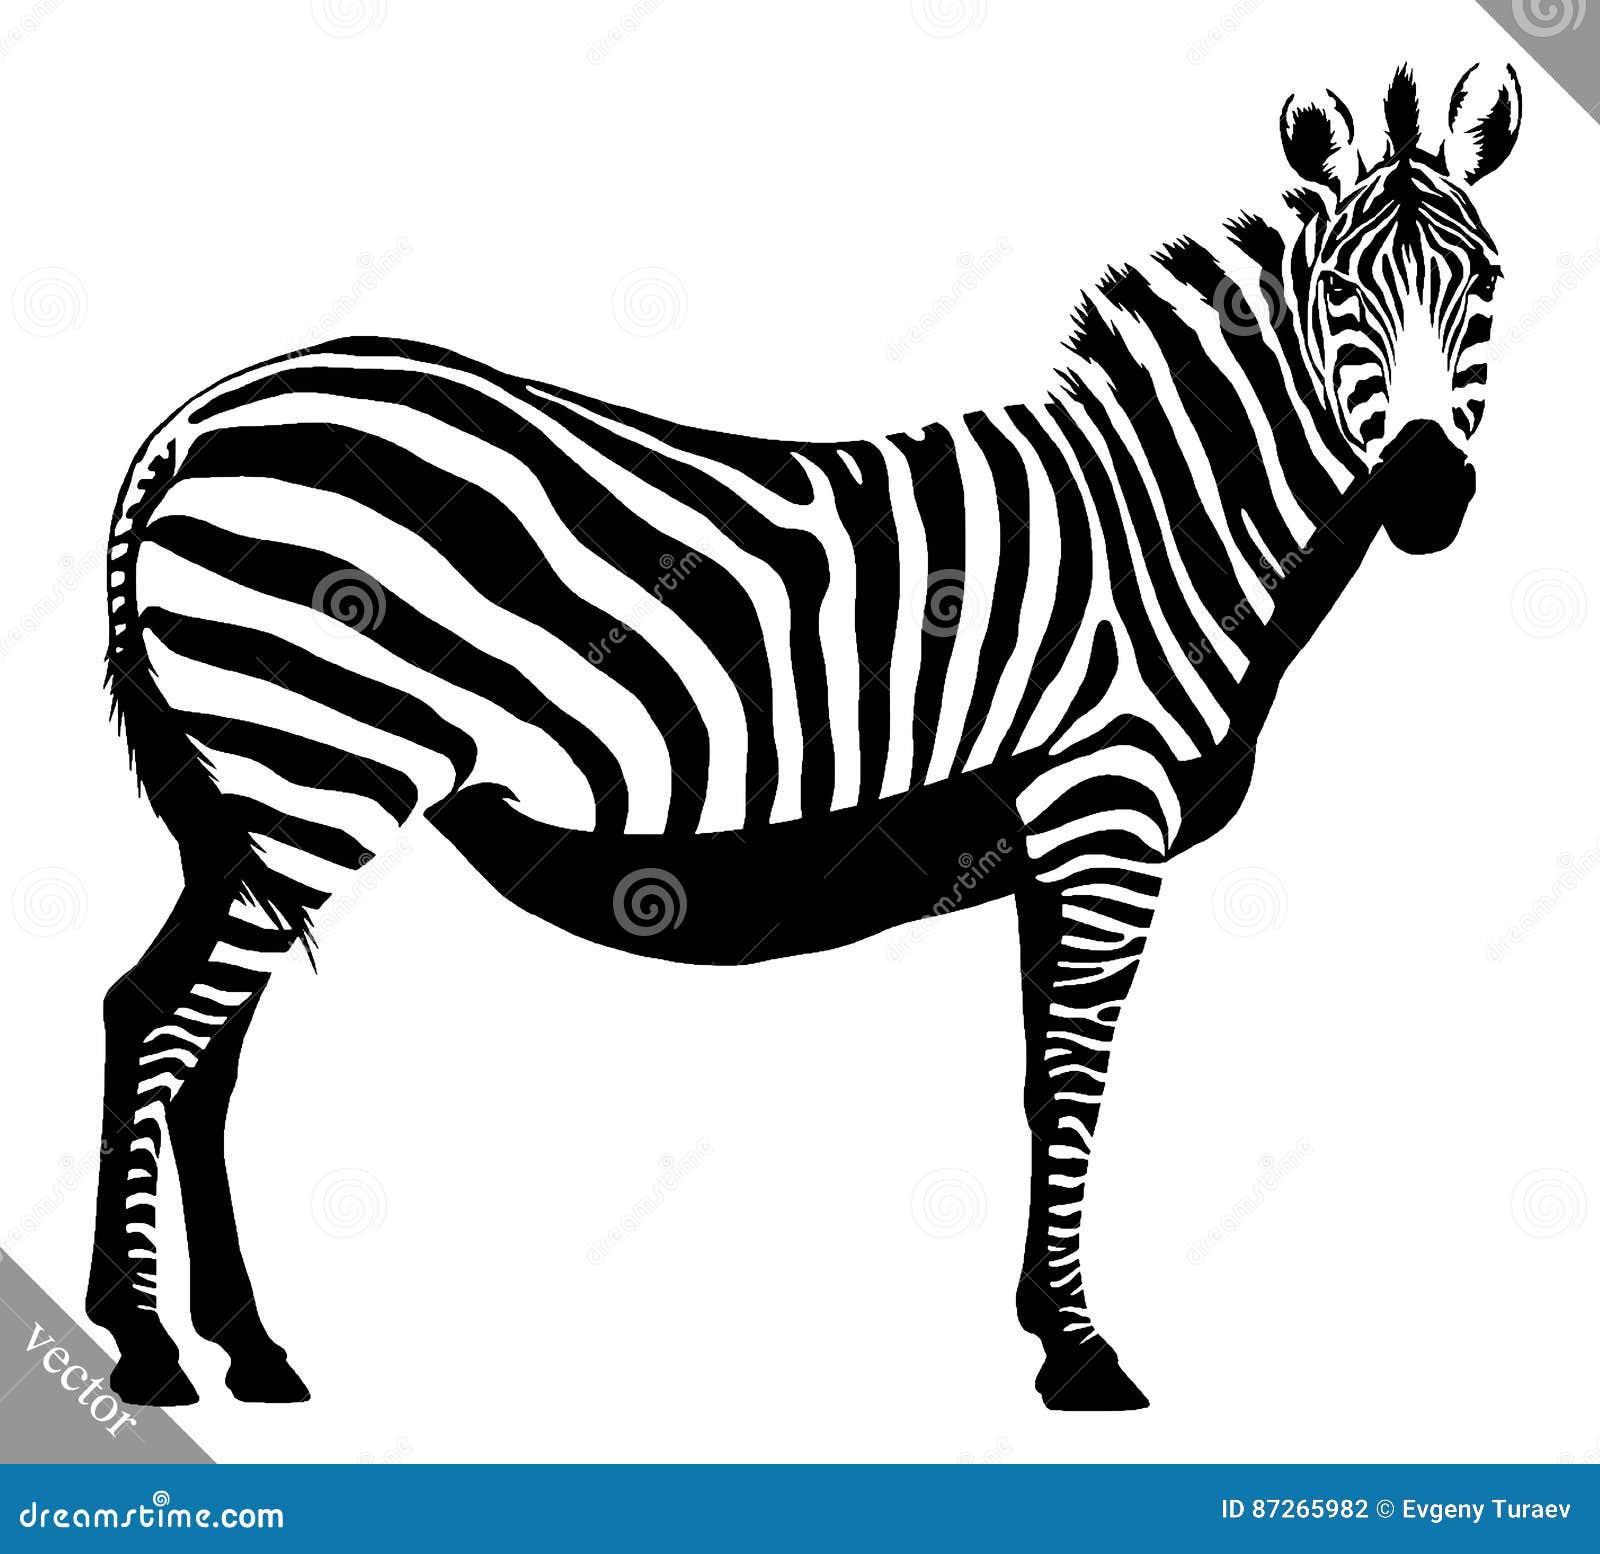 Black And White Linear Paint Draw Zebra Vector Illustration Stock